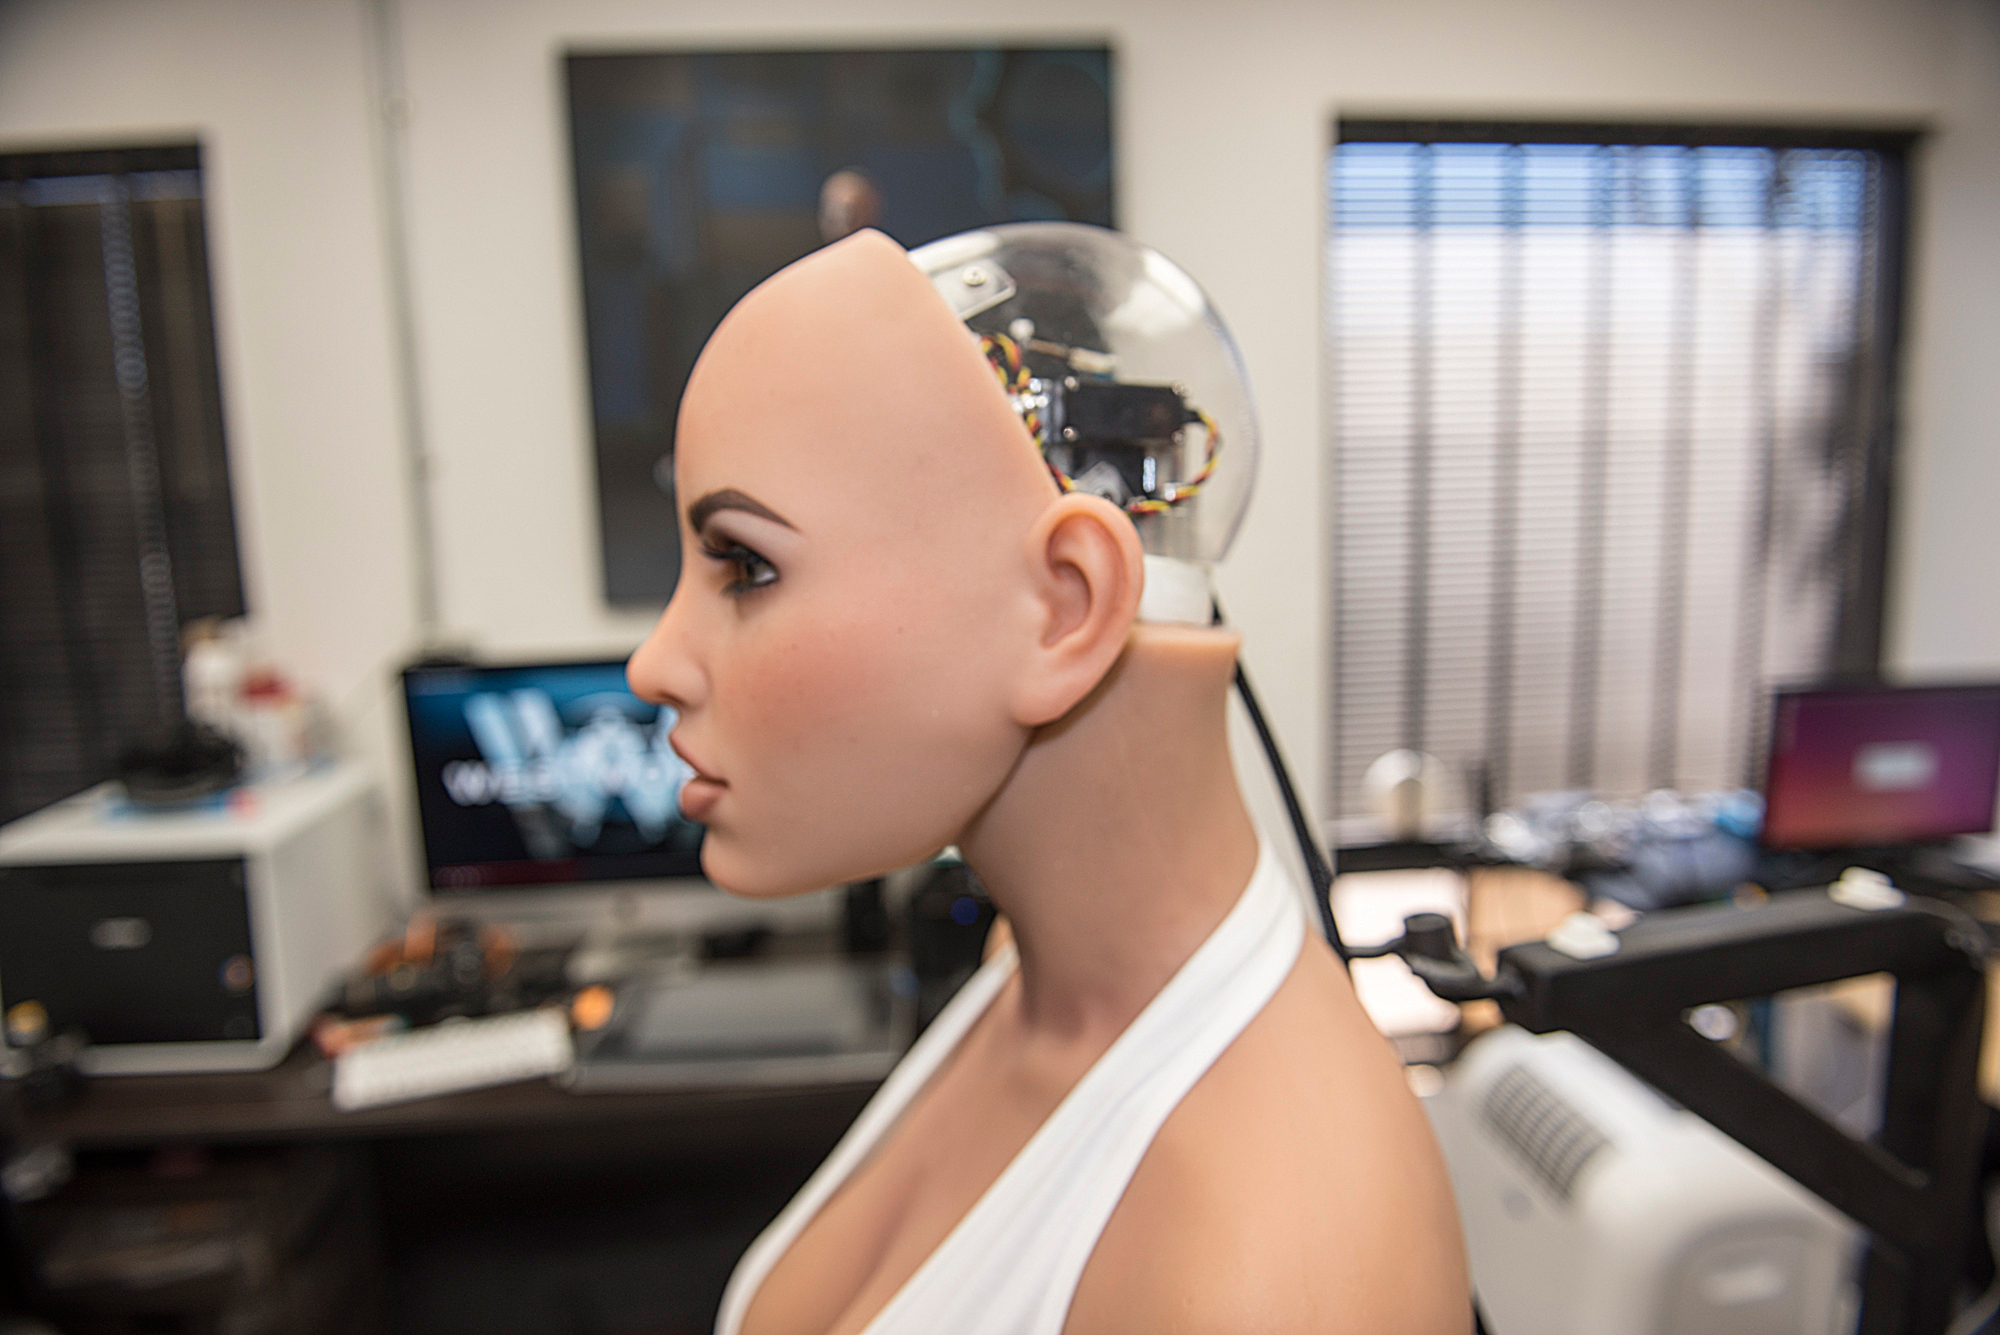 Future Of Sex How Close Are Robotic Love Dolls